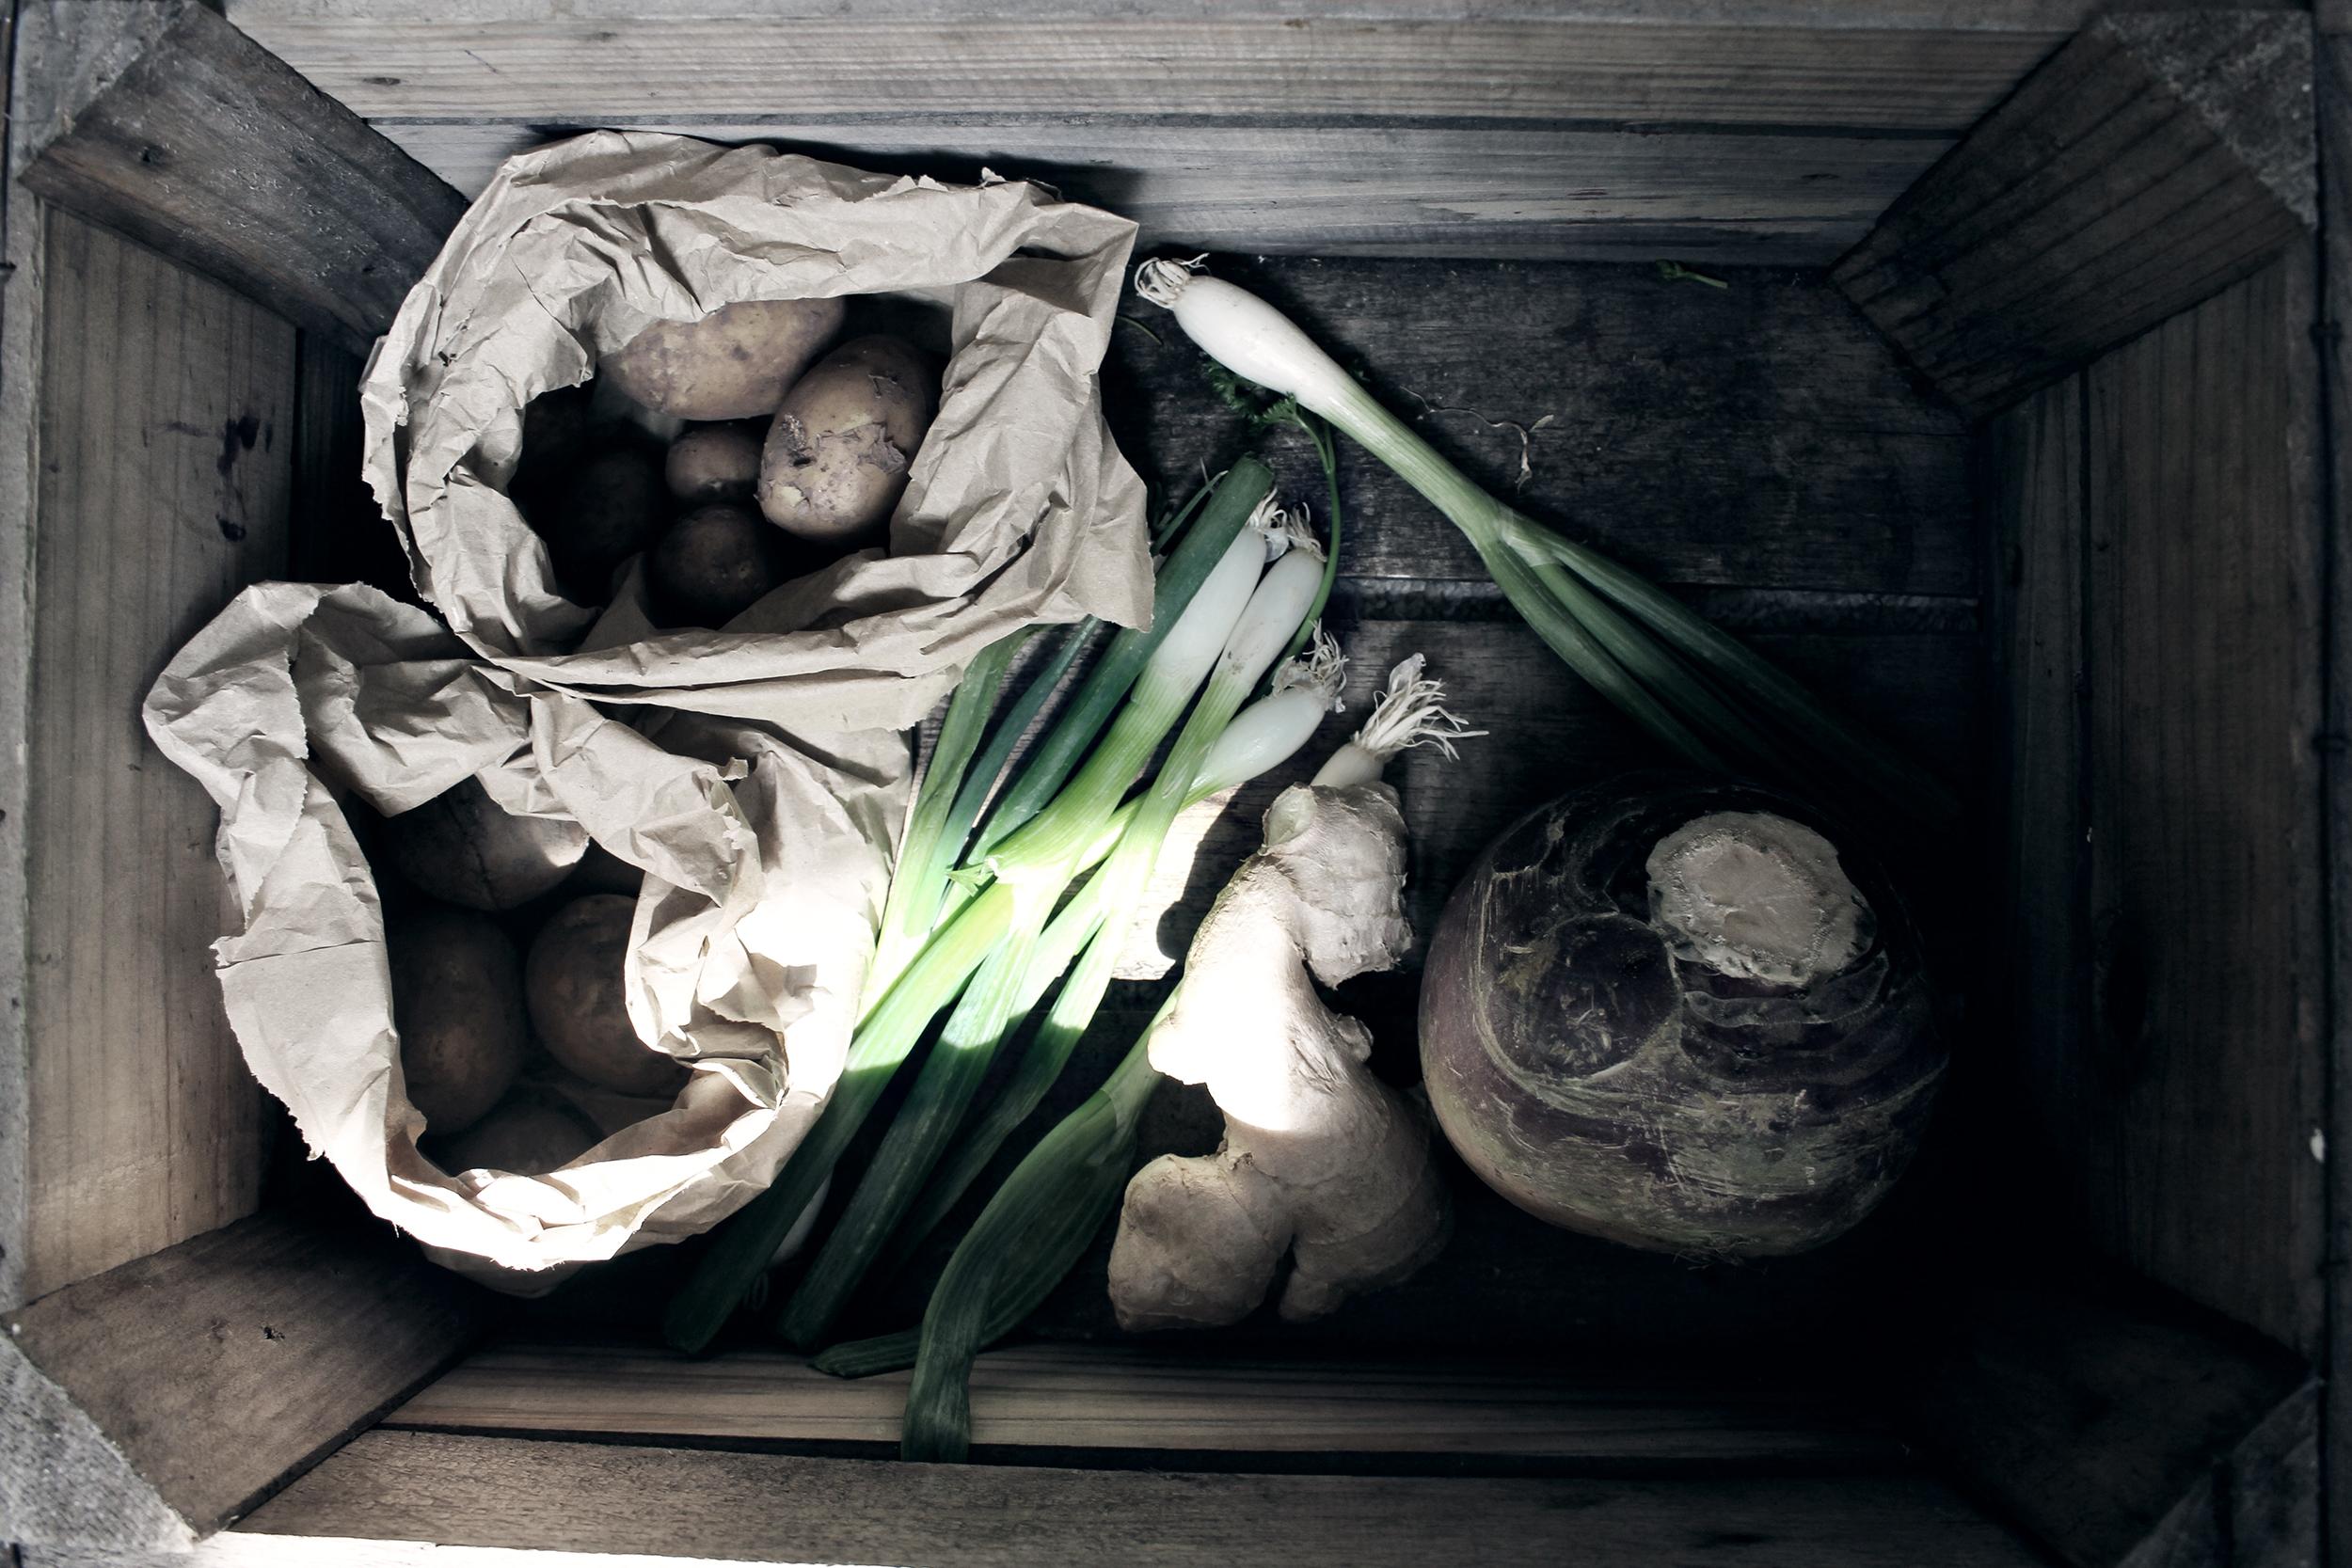 Root-veg